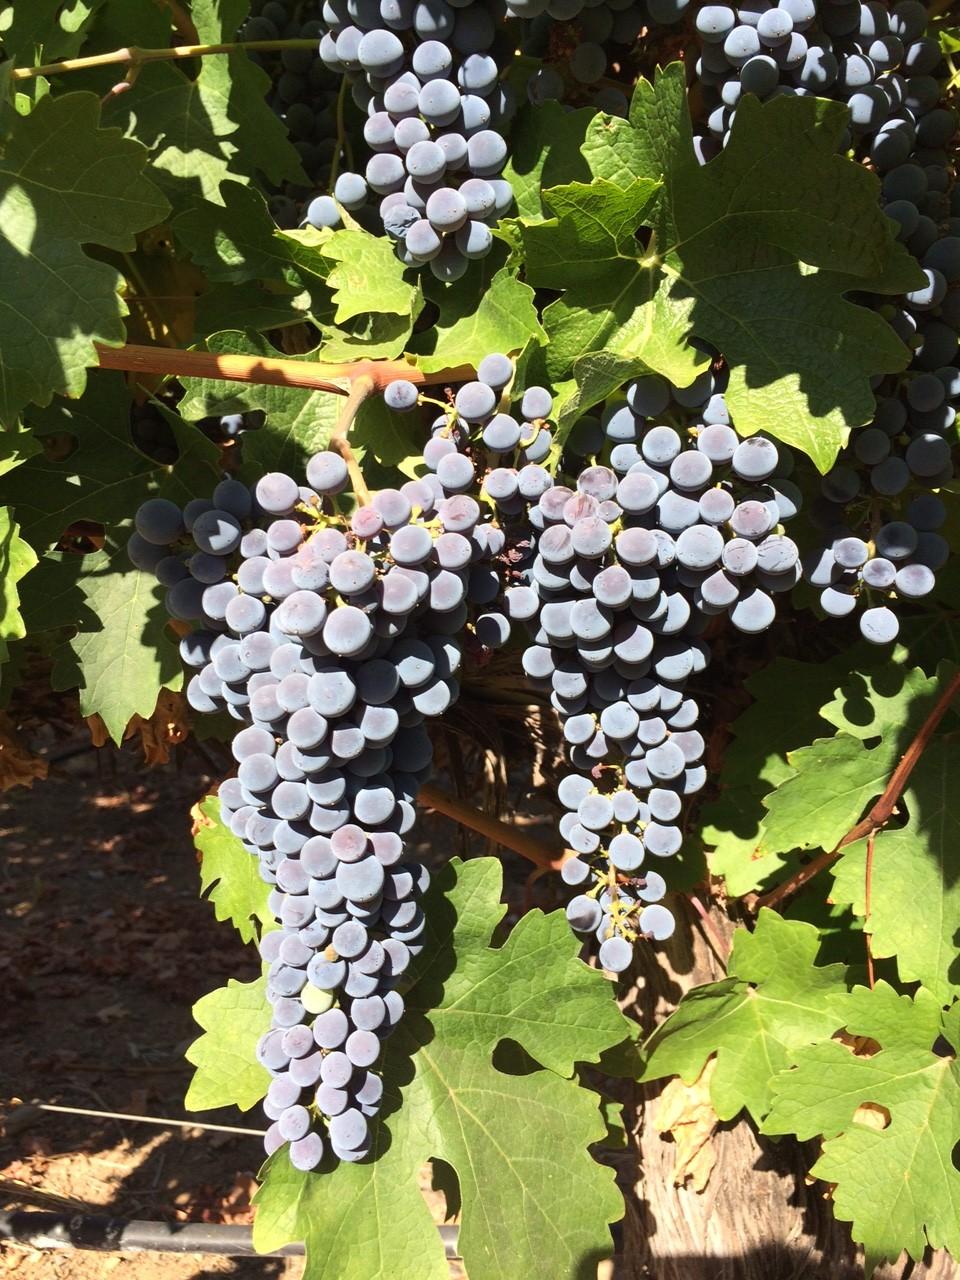 2015 Harvest 7-28-15 01